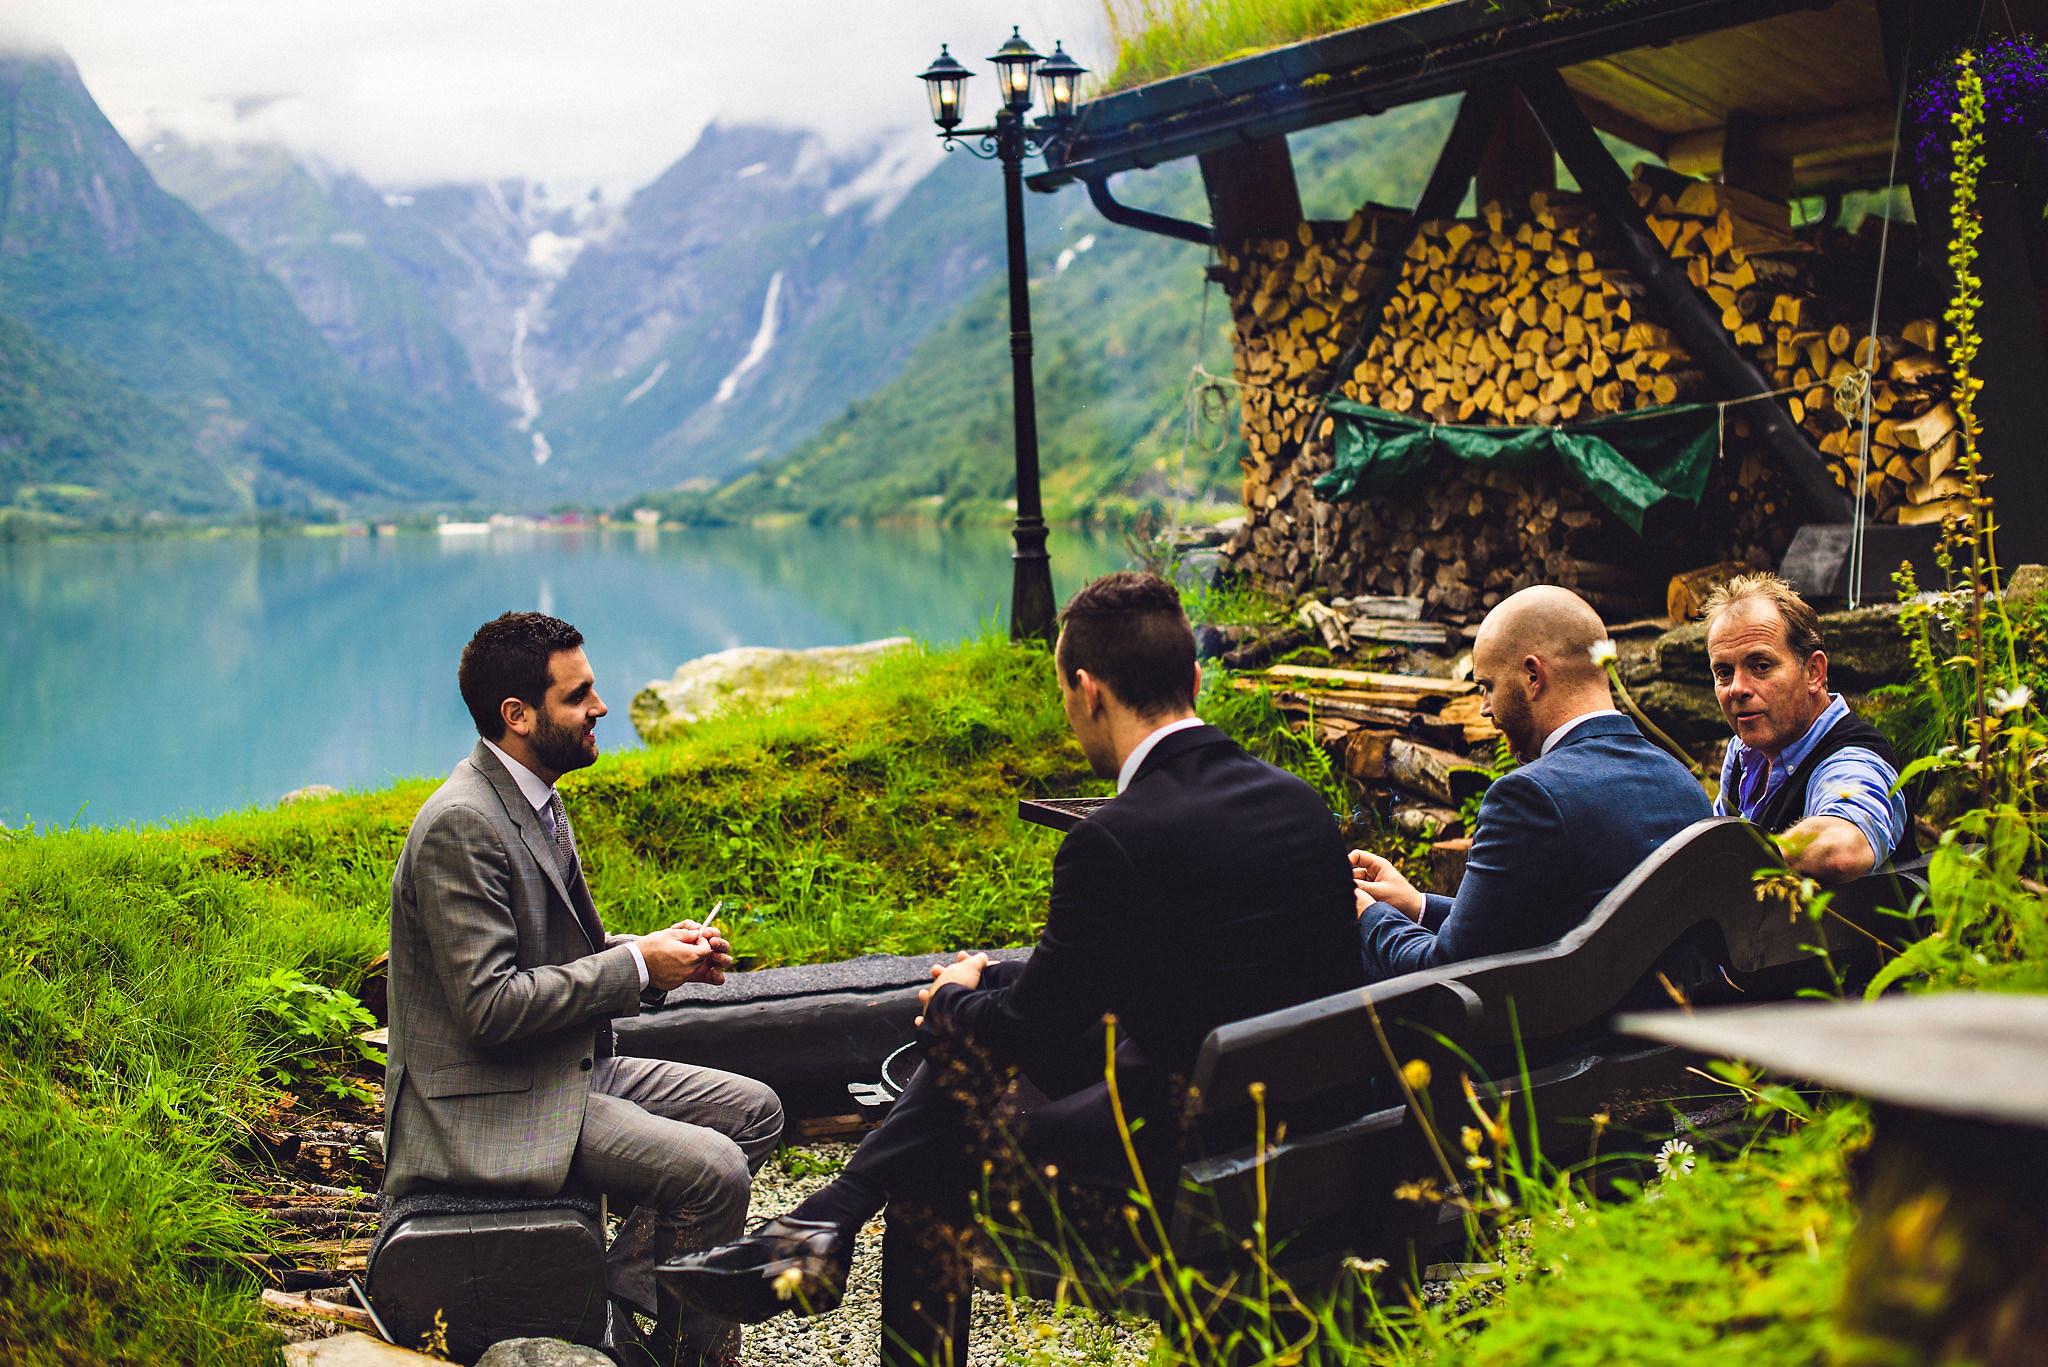 Bryllup på Yrineset i Oldedalen bryllupsfotograf sogn og fjordane-31.jpg